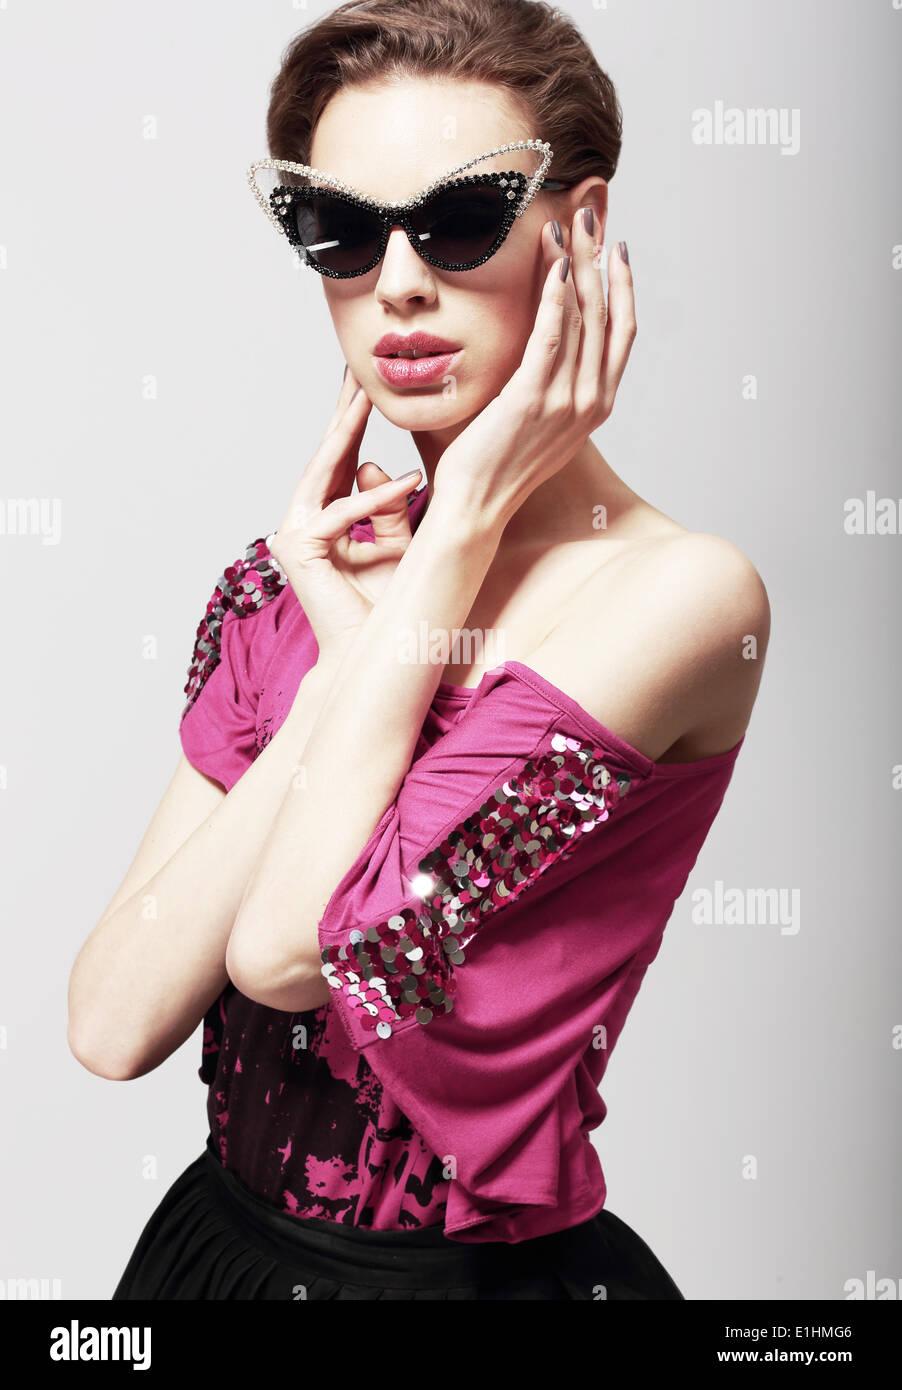 High Fashion. Glamorous Elegant Woman in Dark Sunglasses. Magnetism - Stock Image